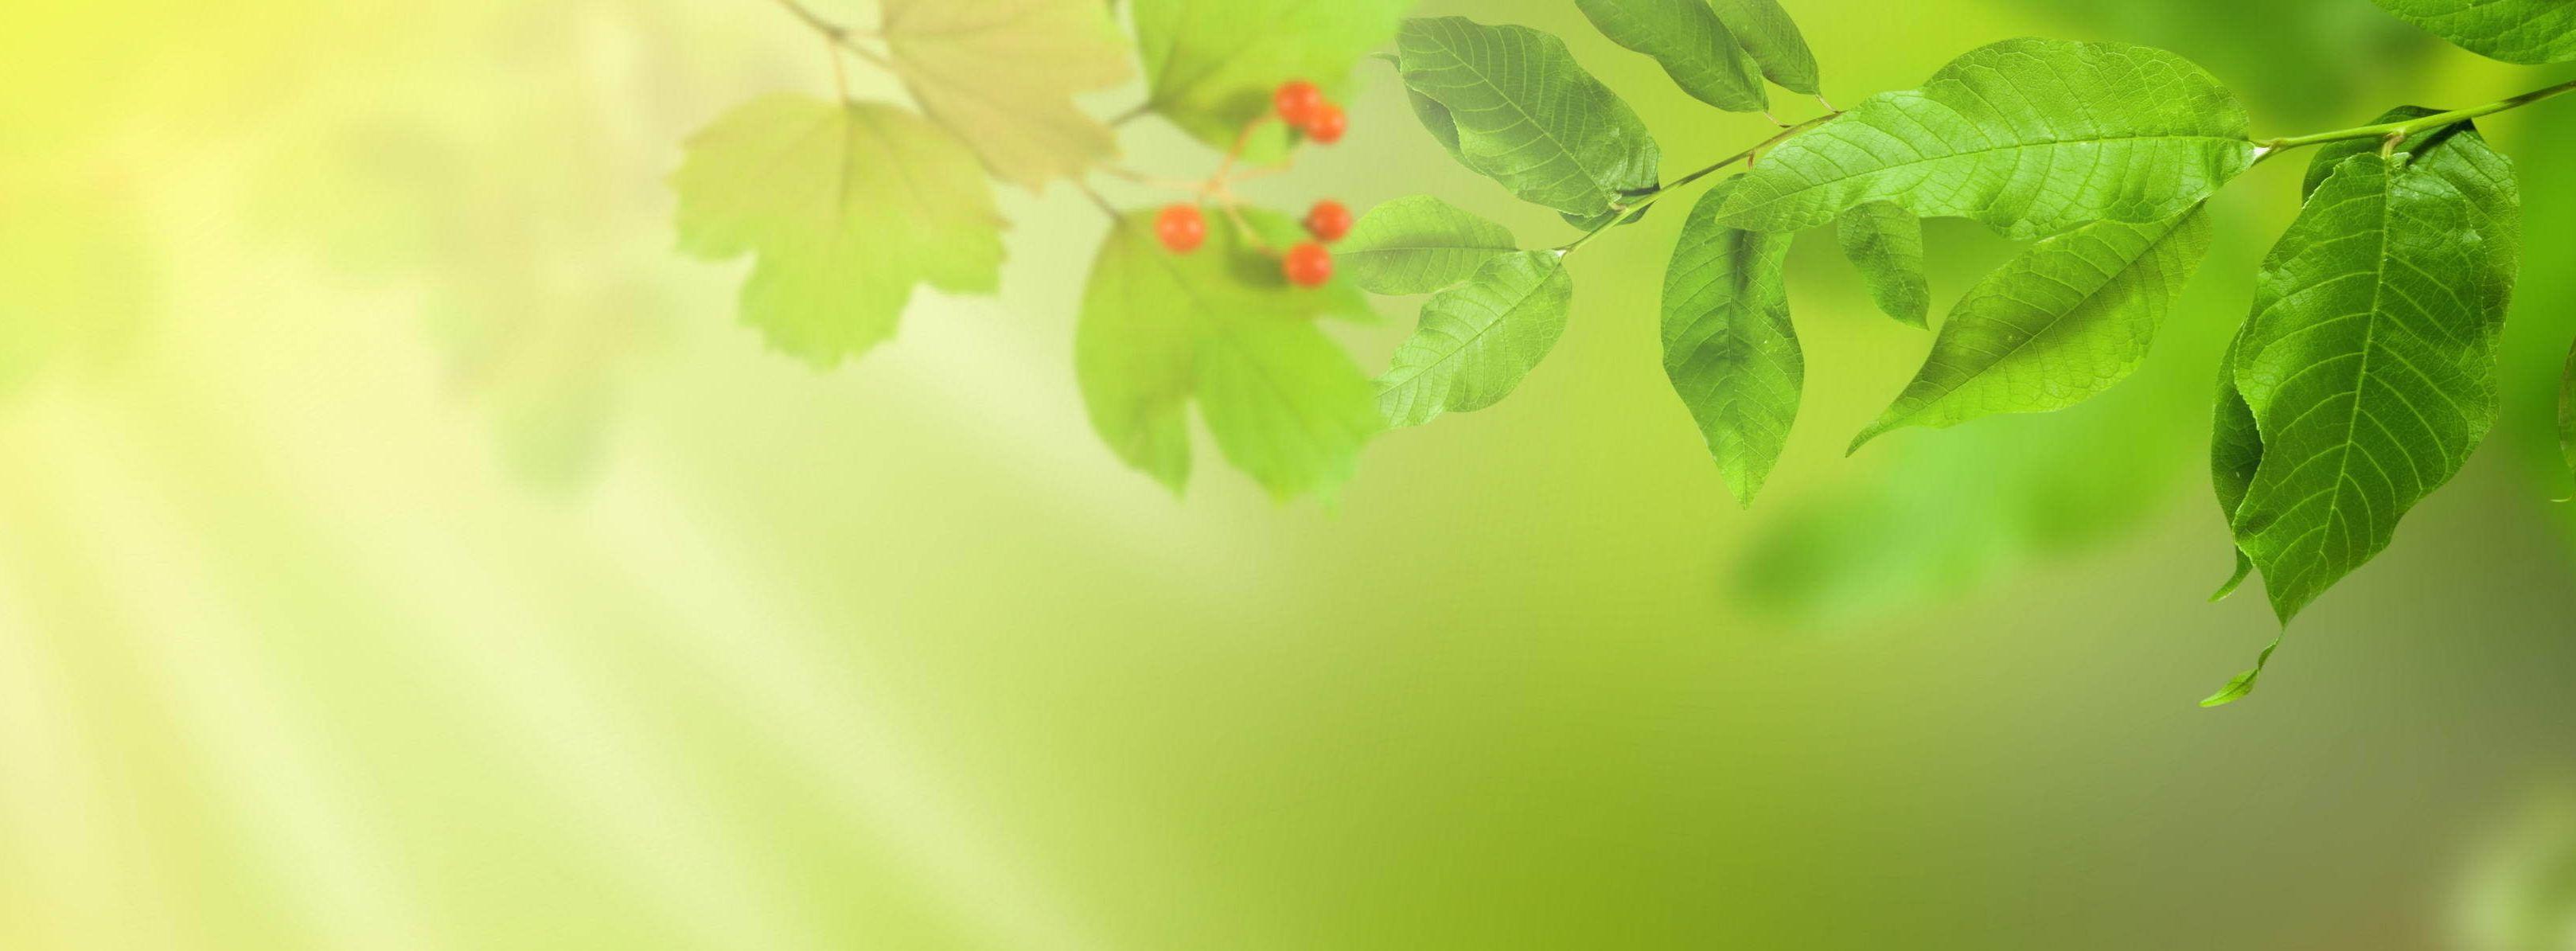 Зелена студія